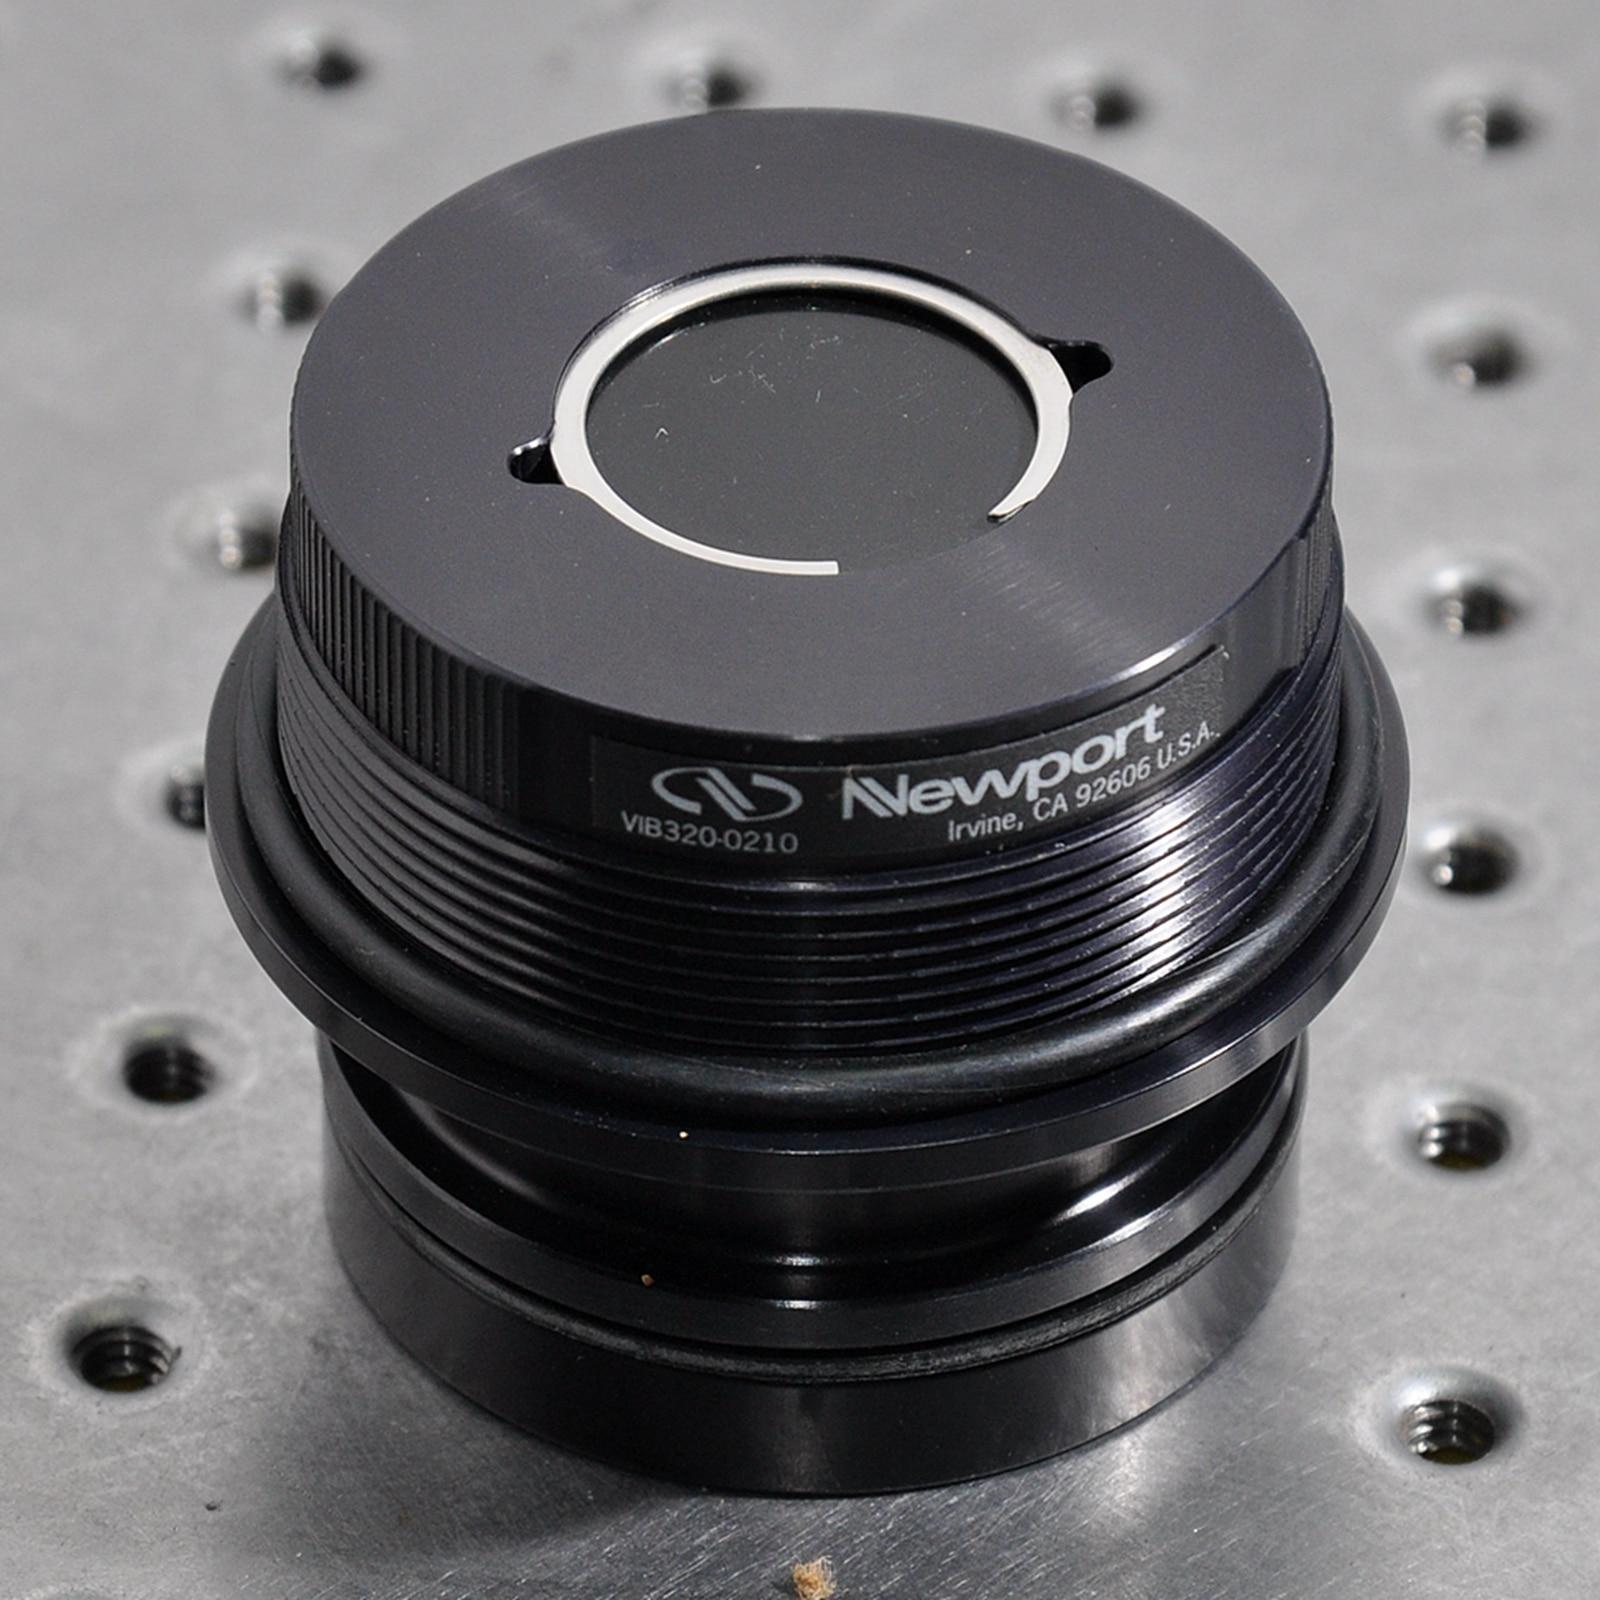 Newport VIB320-0210 Vibration Isolator